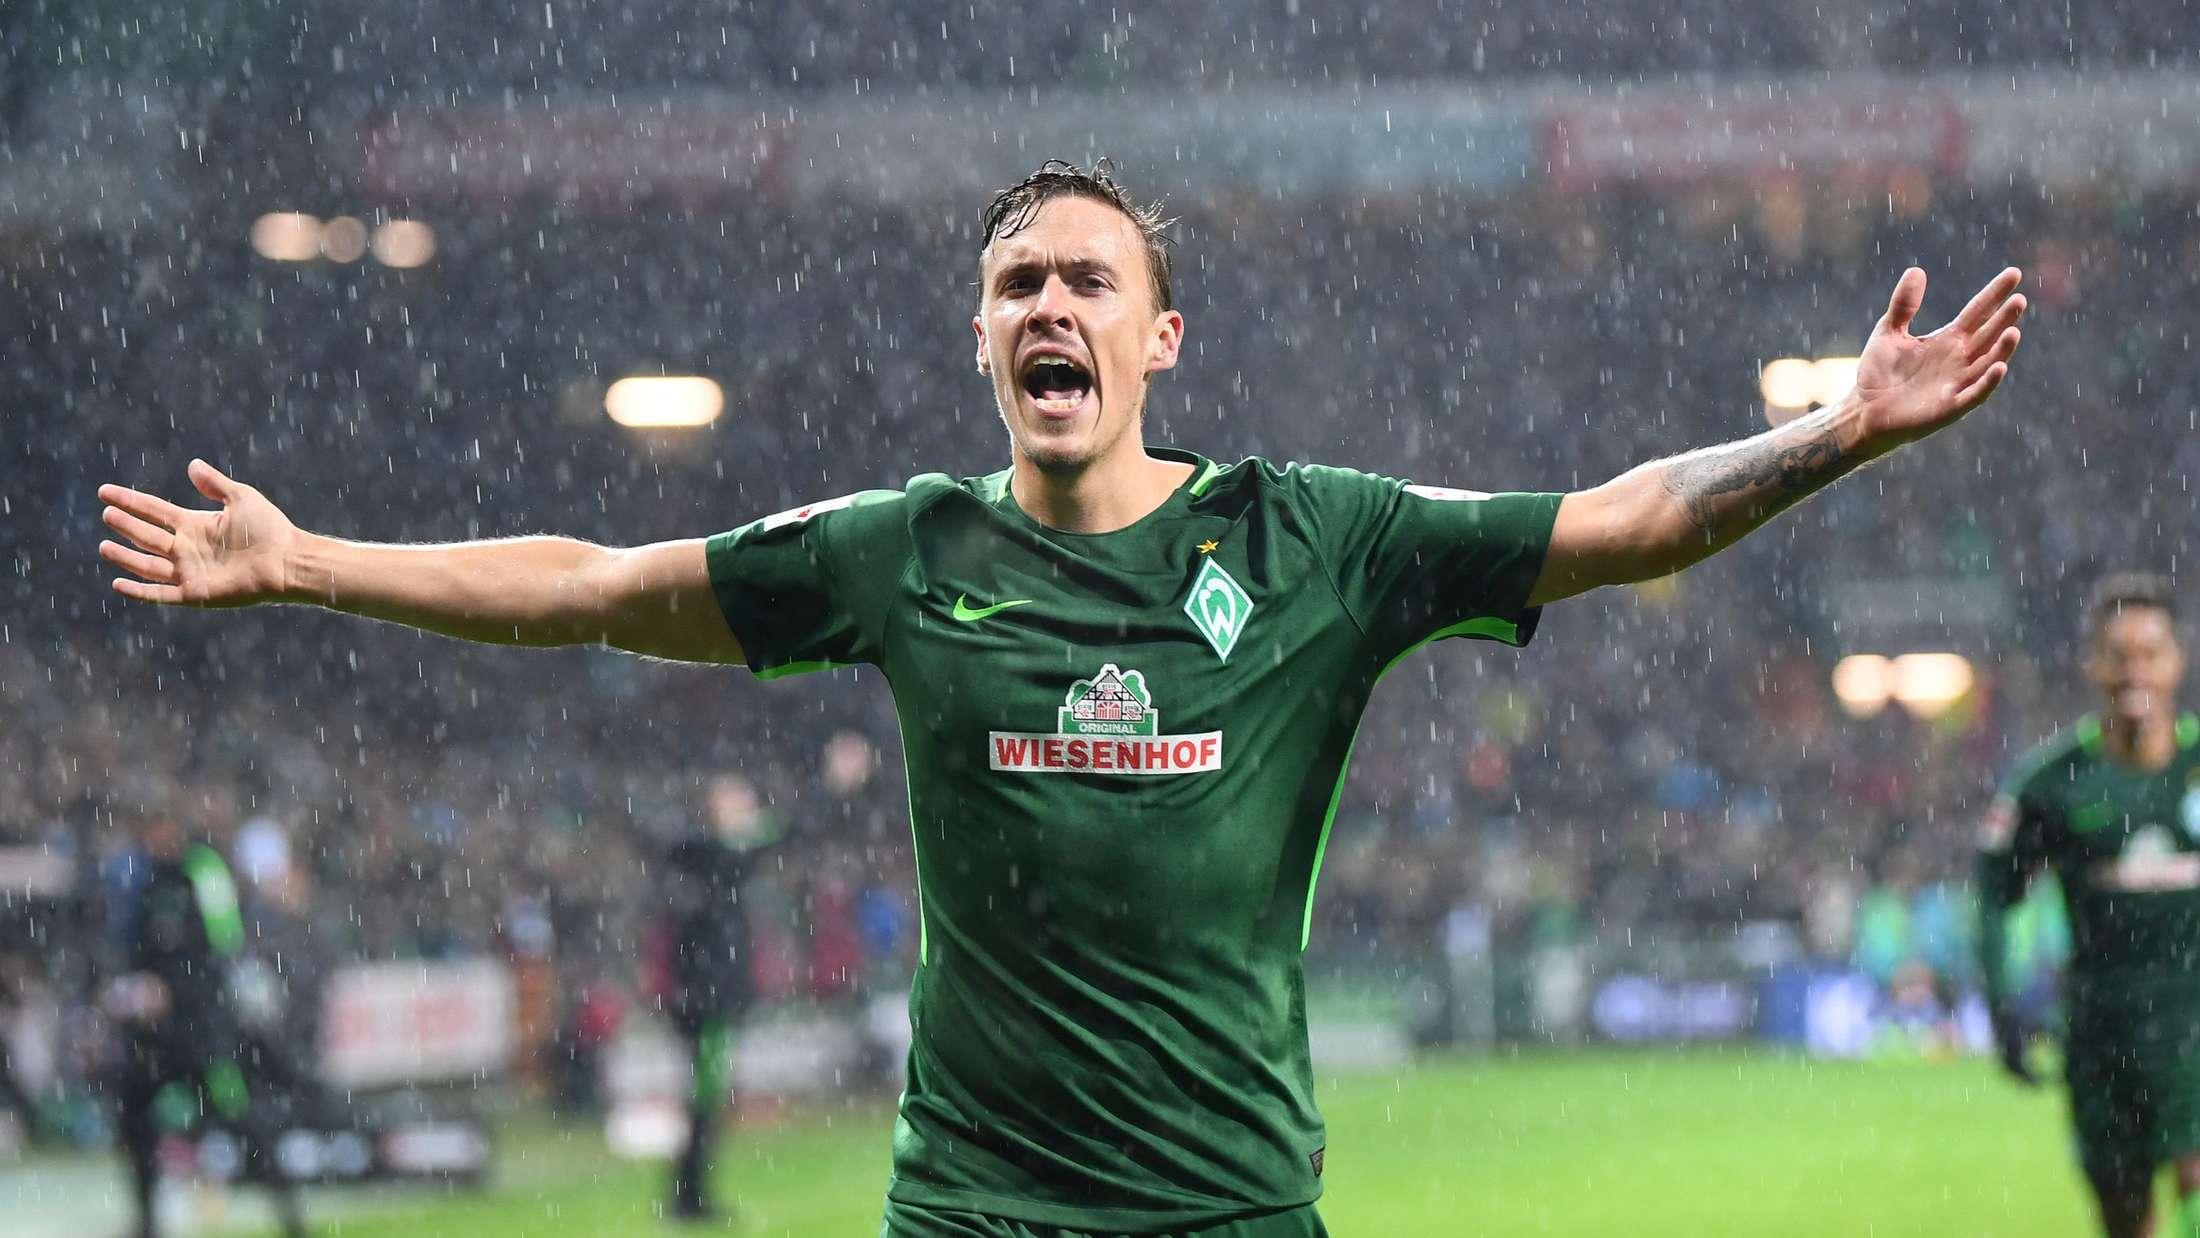 Spiel Hannover 96 Heute